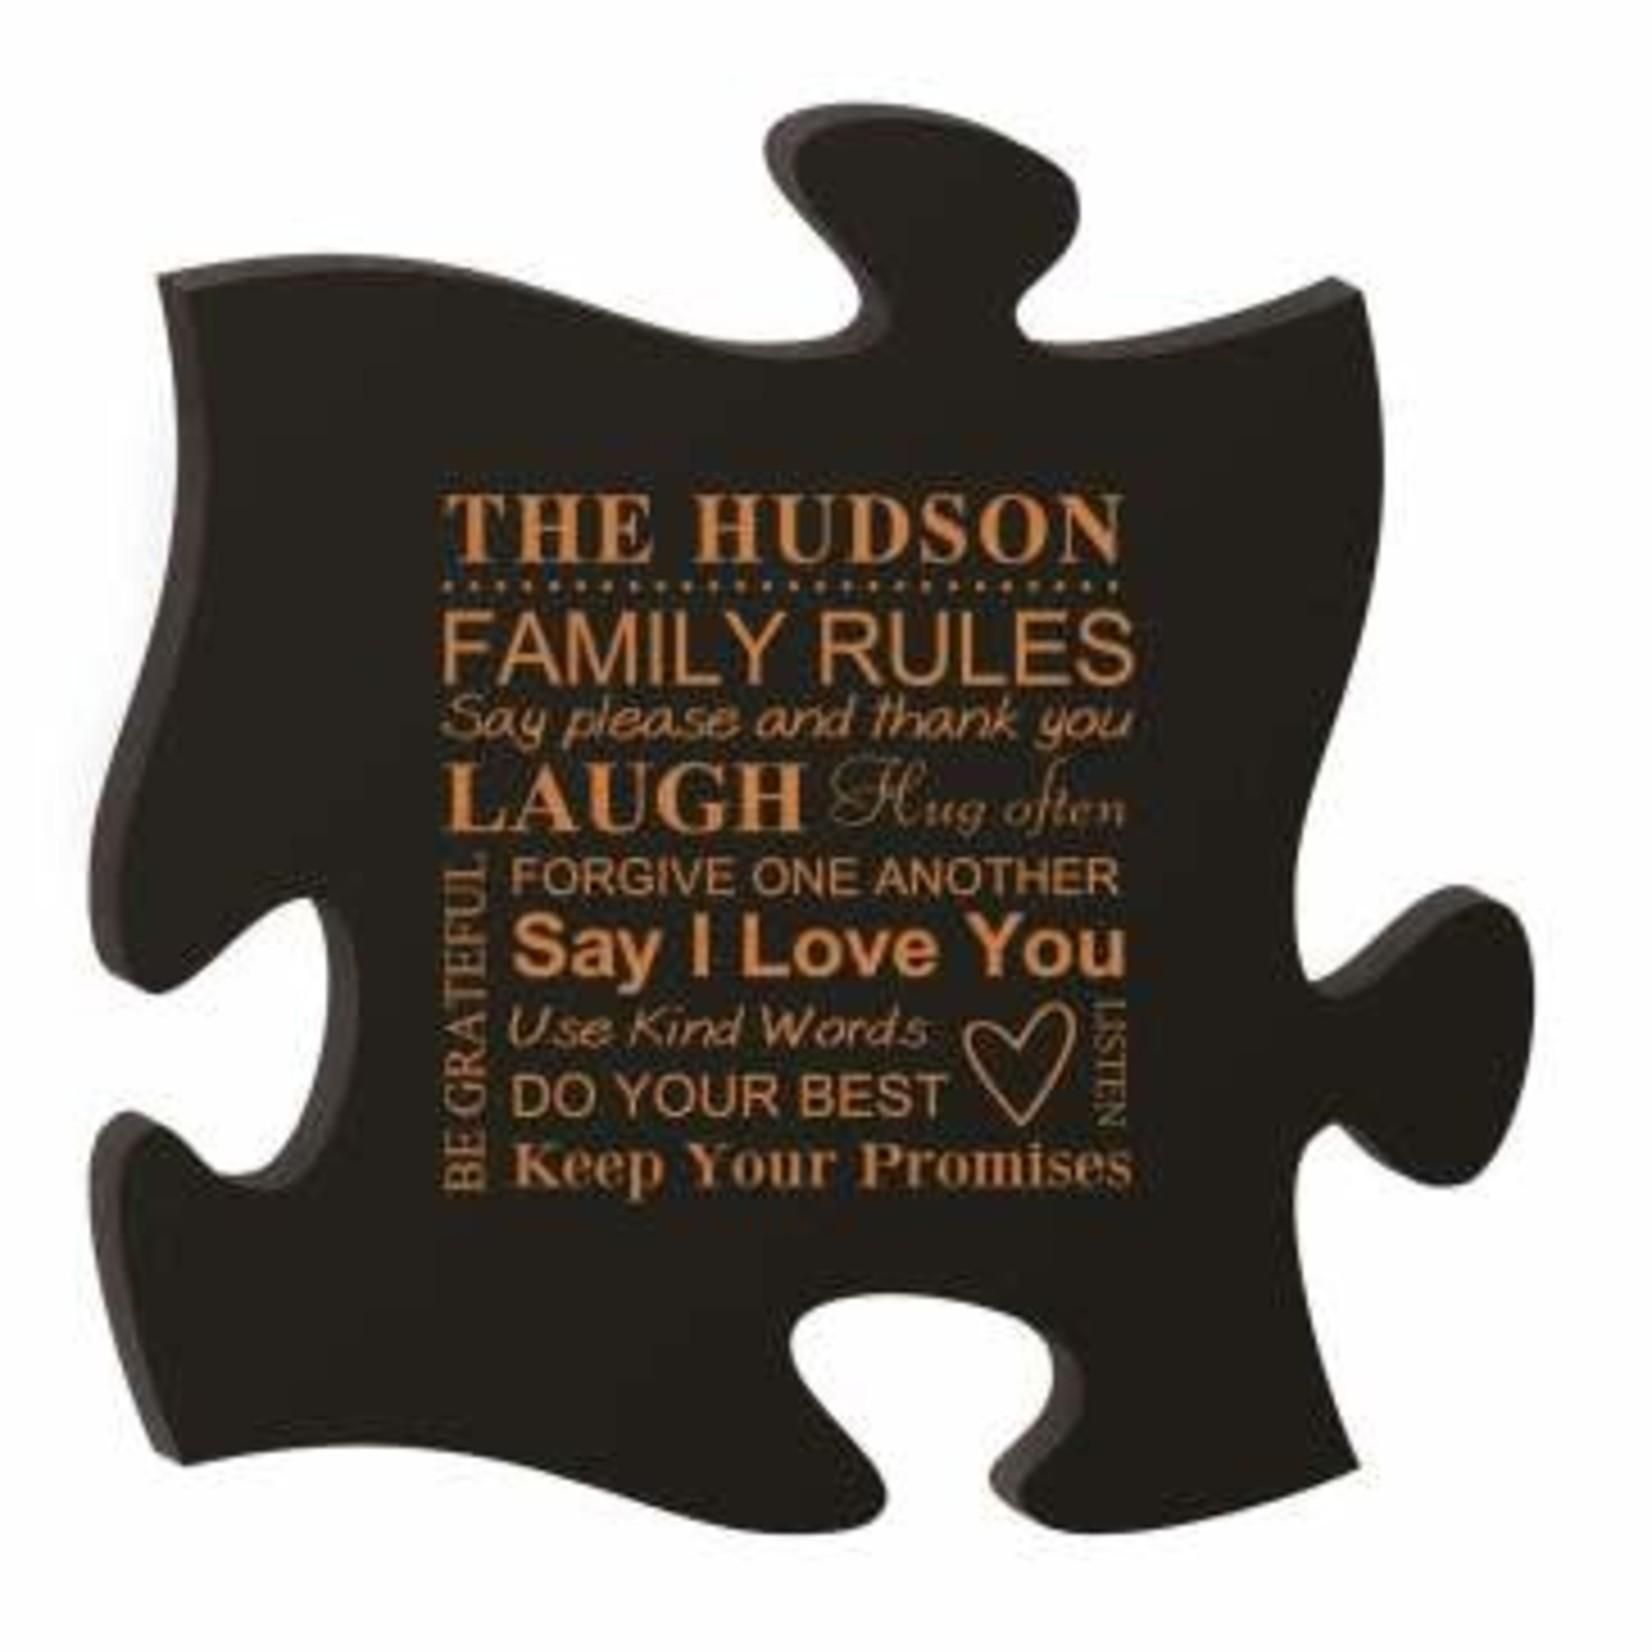 Puzzle Plaque - Black (No Photo)